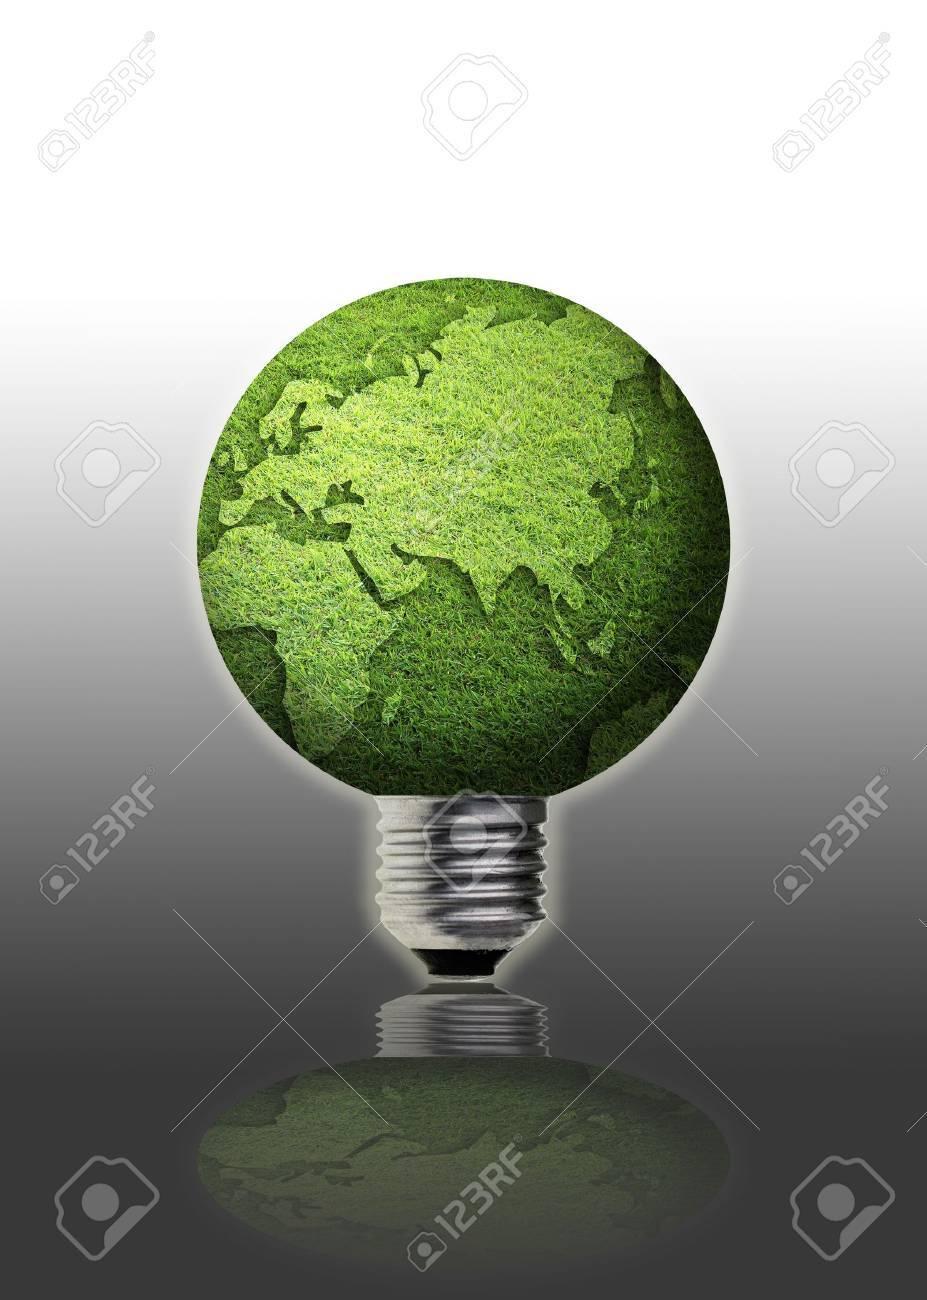 art work of grass globe with light bulb. Stock Photo - 10035159